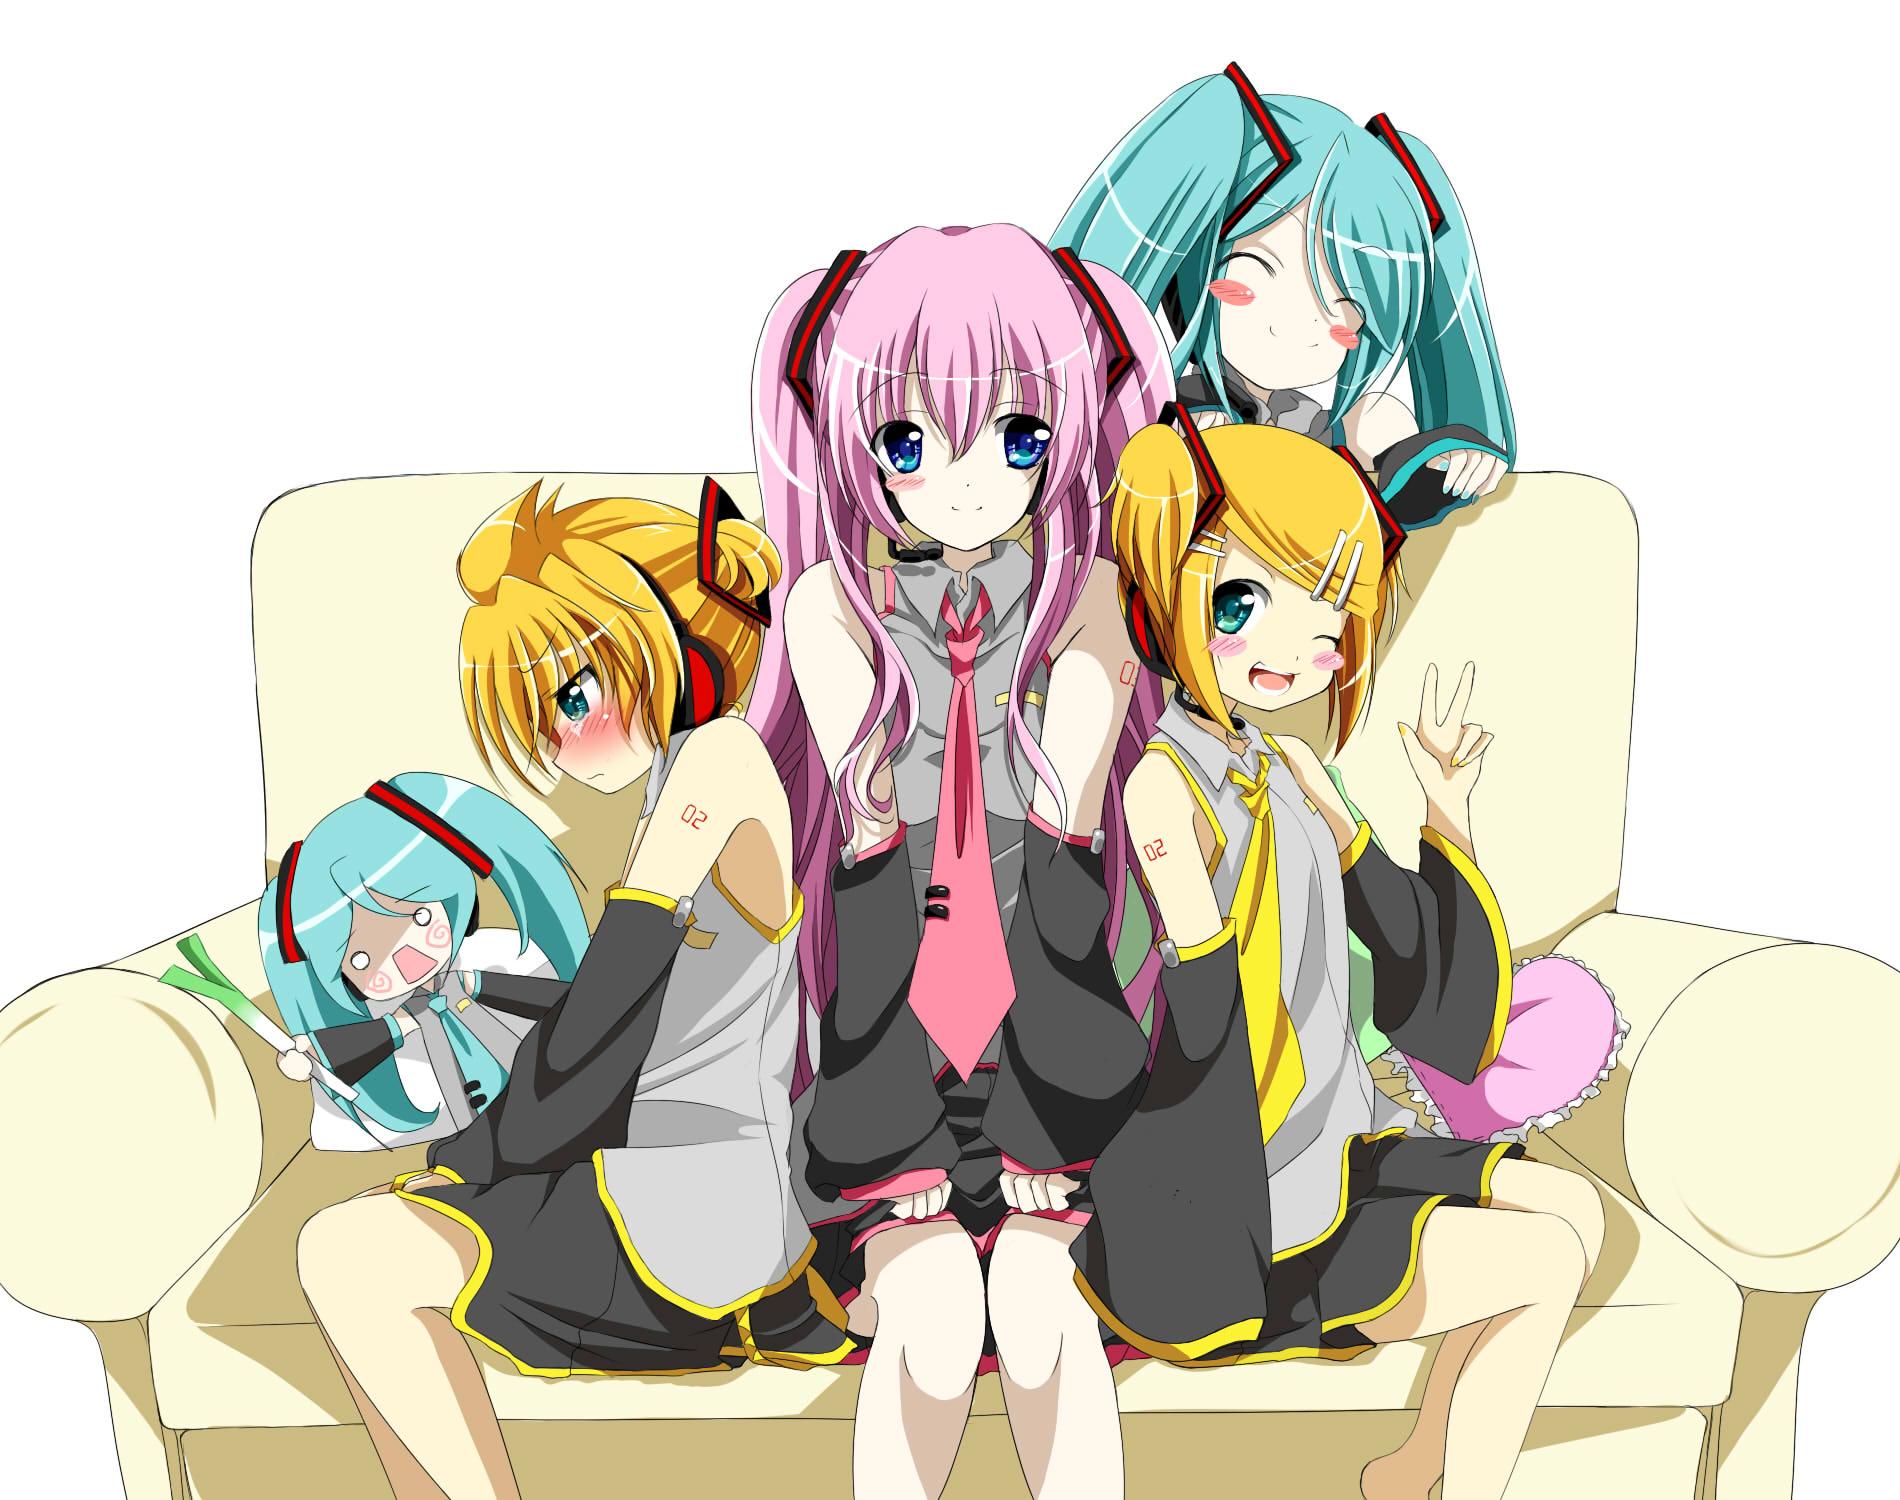 vocaloid image #336026 - zerochan anime image board